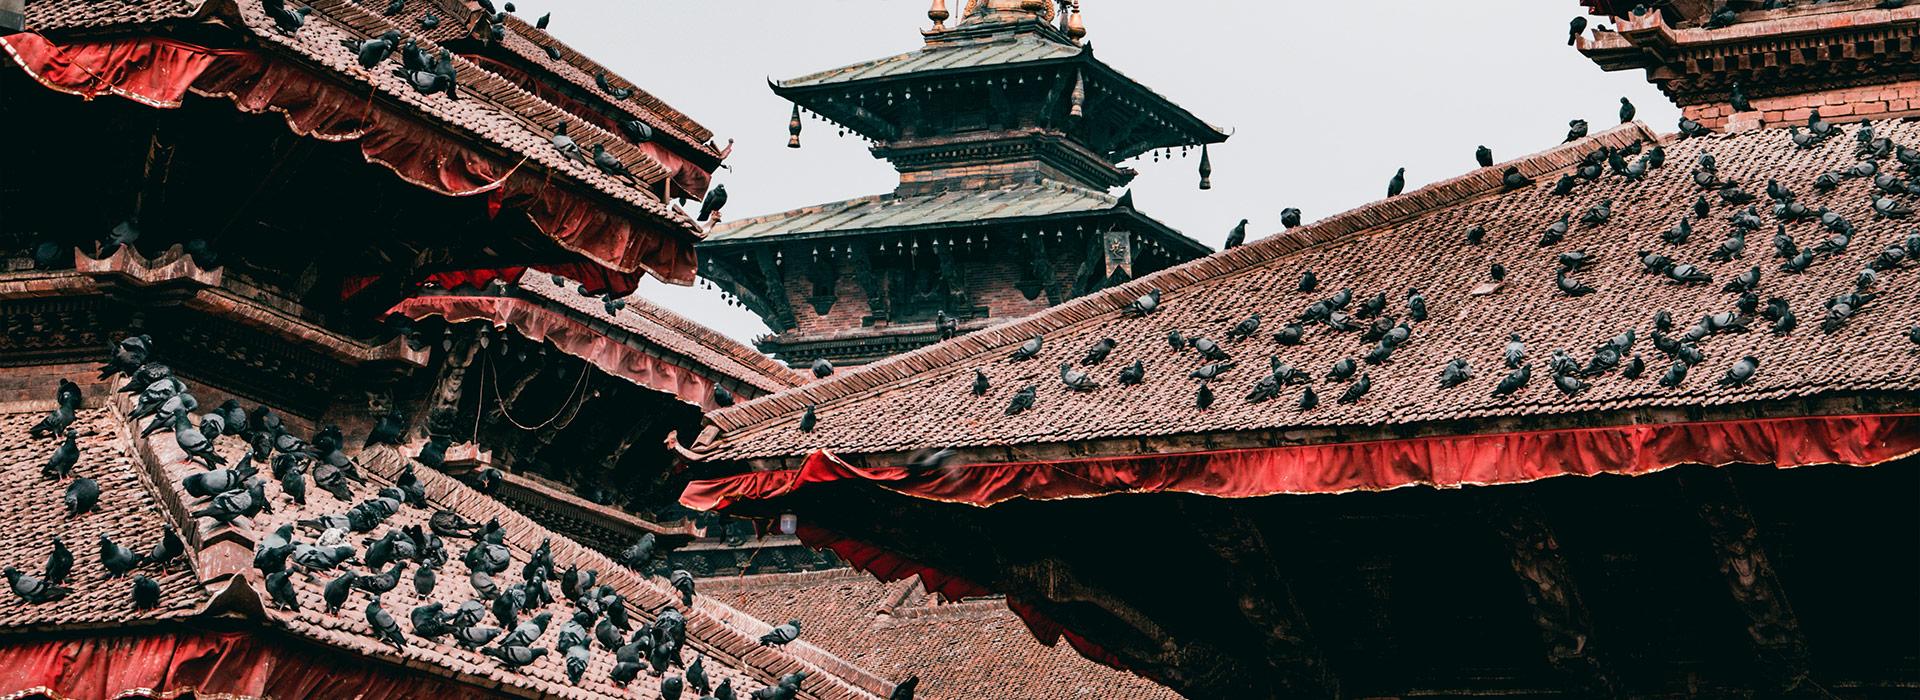 Reisen nach Nepal - Individuelle Reisen nach Nepal - Harry Kolb AG - Tourismus